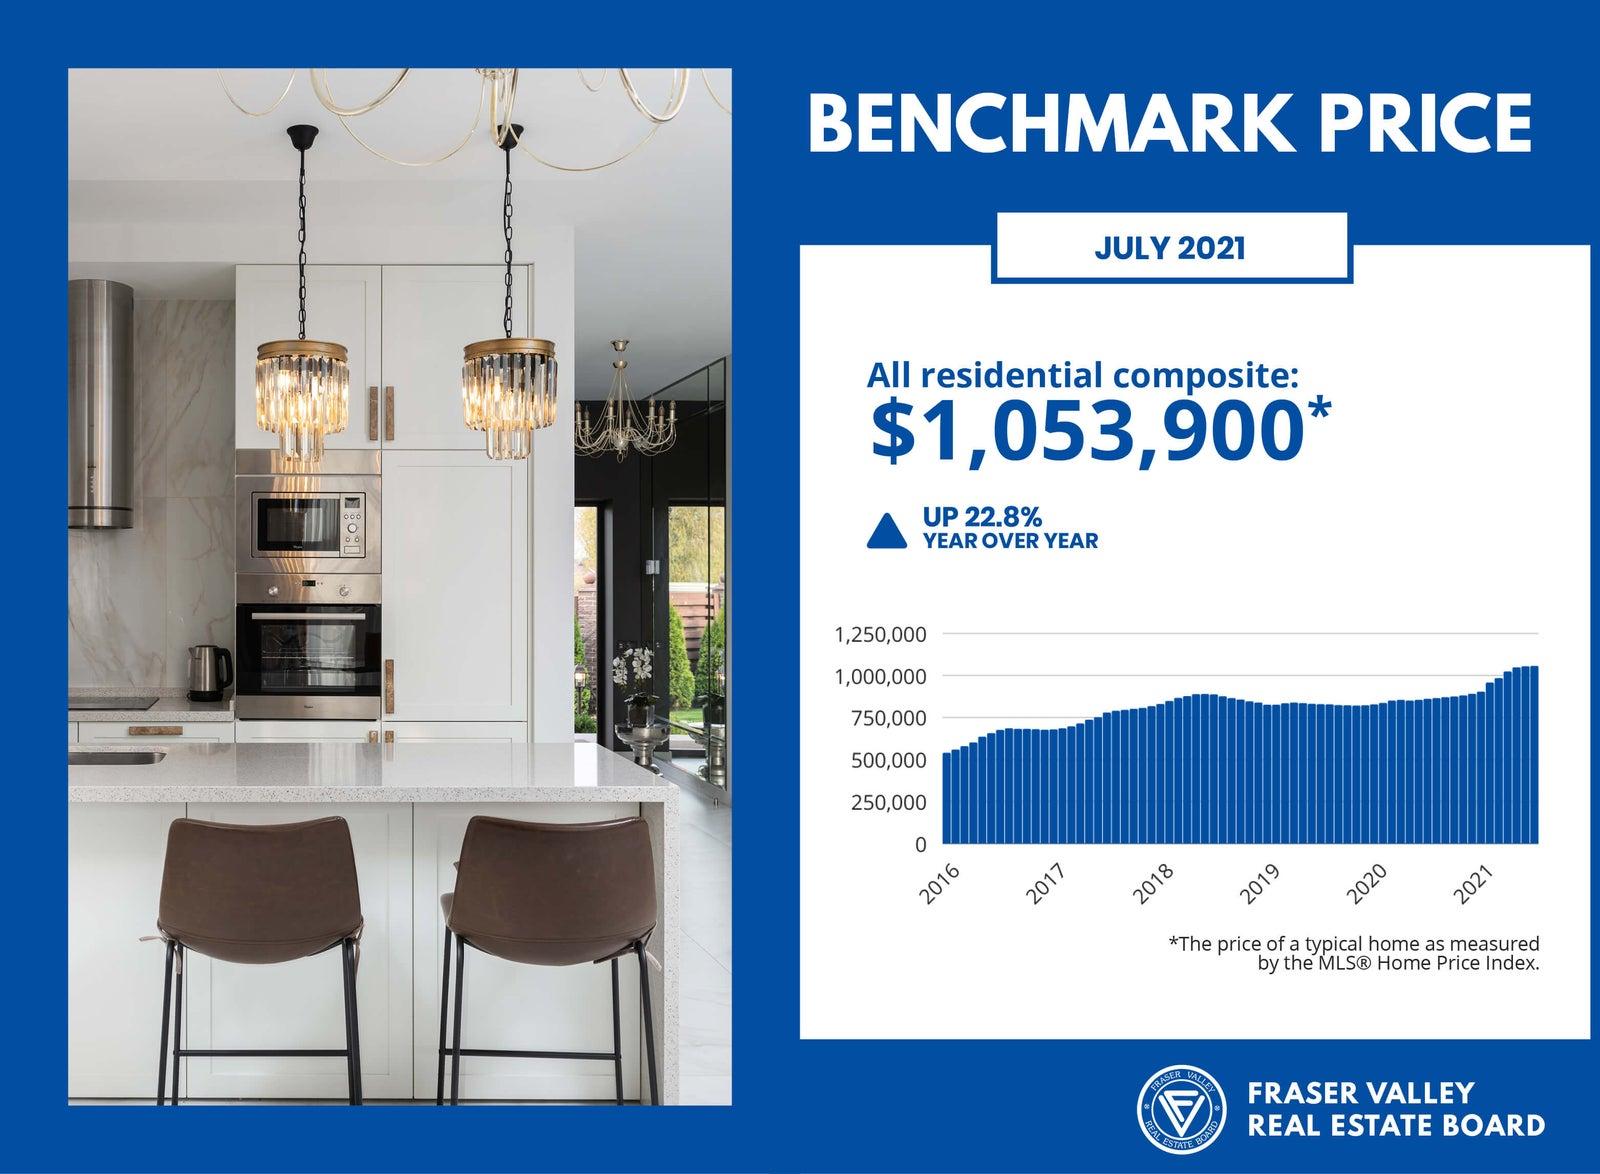 Fraser Valley Housing Market - Benchmark Price for July 2021